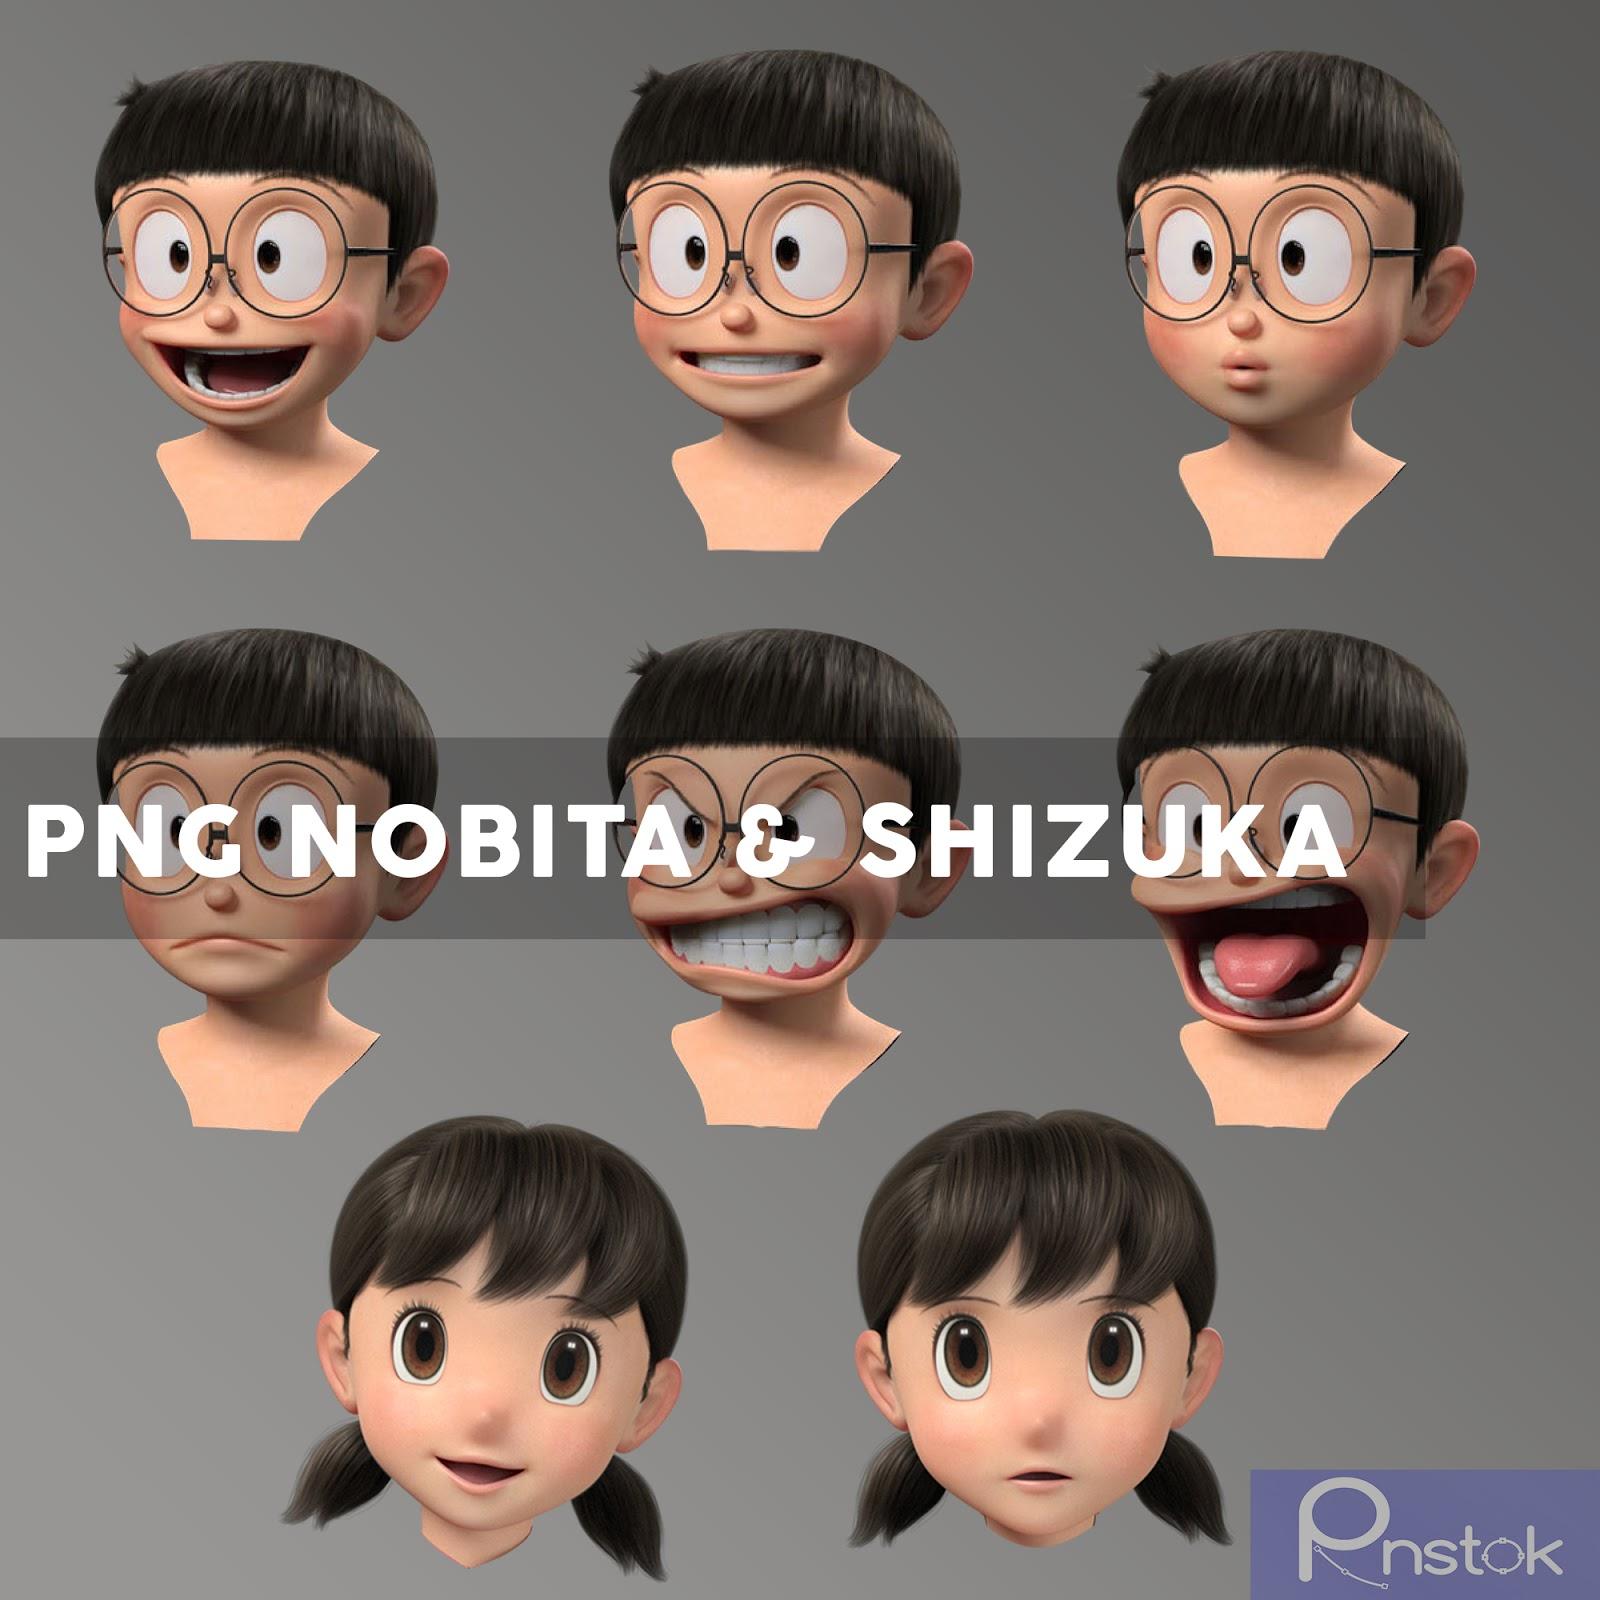 Gambar Kepala Nobita Png Koleksi Gambar Hd